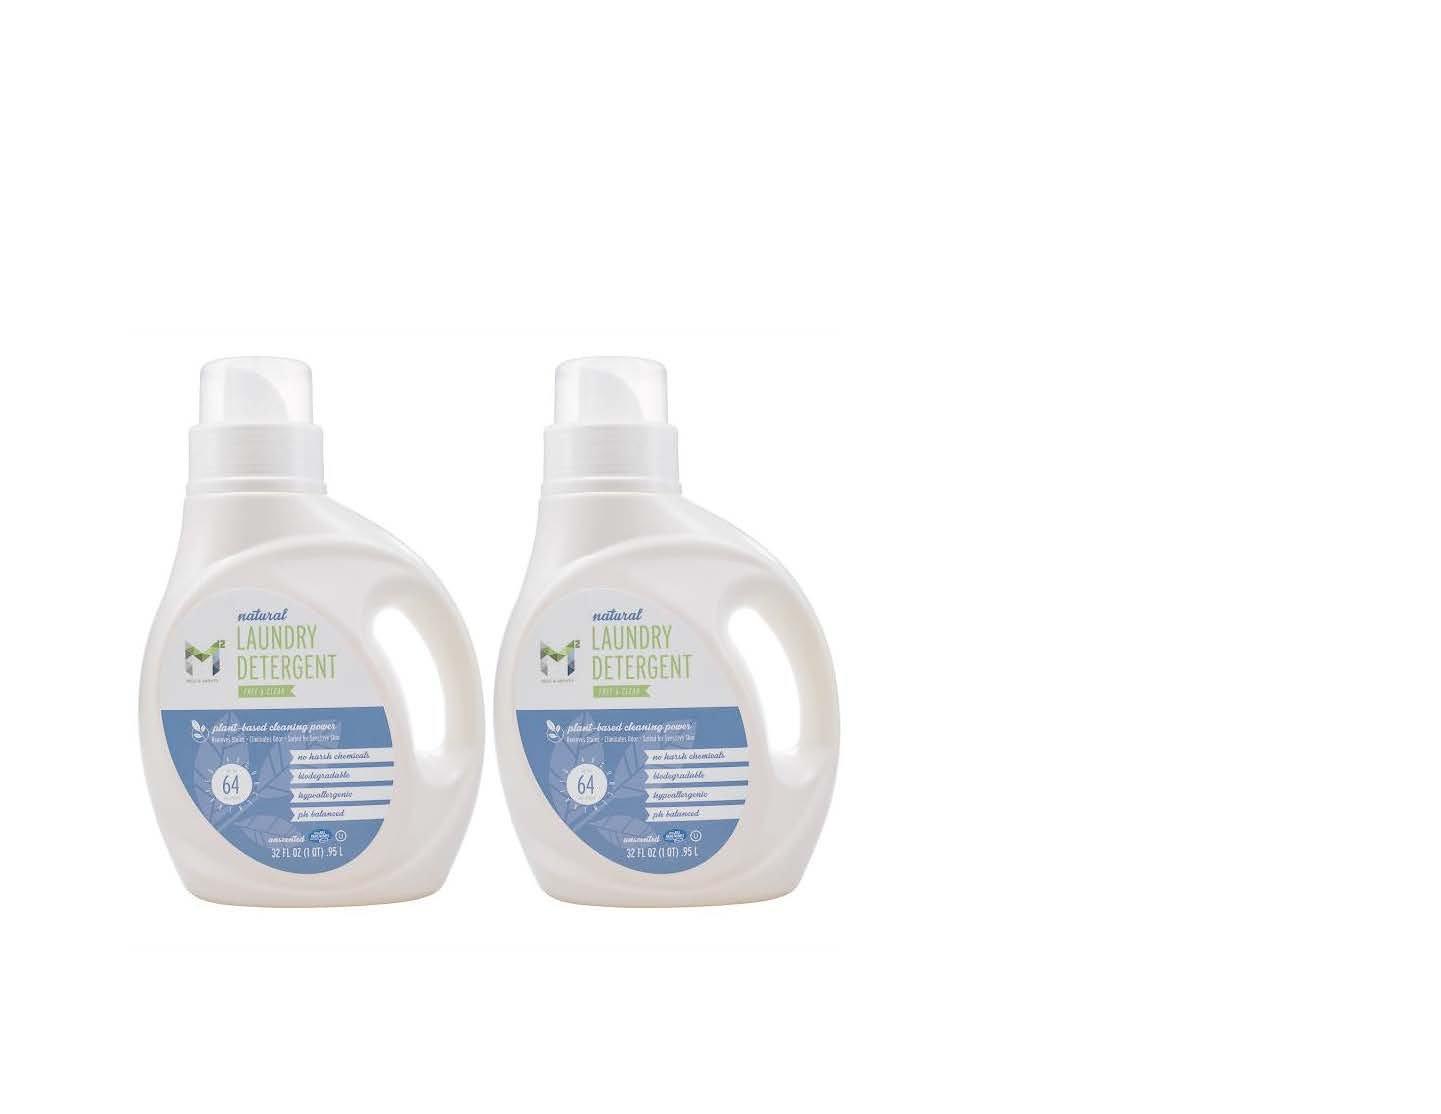 m2ランドリー洗剤フリー&クリアすべて自然32ozパックof 2 B07DL3ZW4L